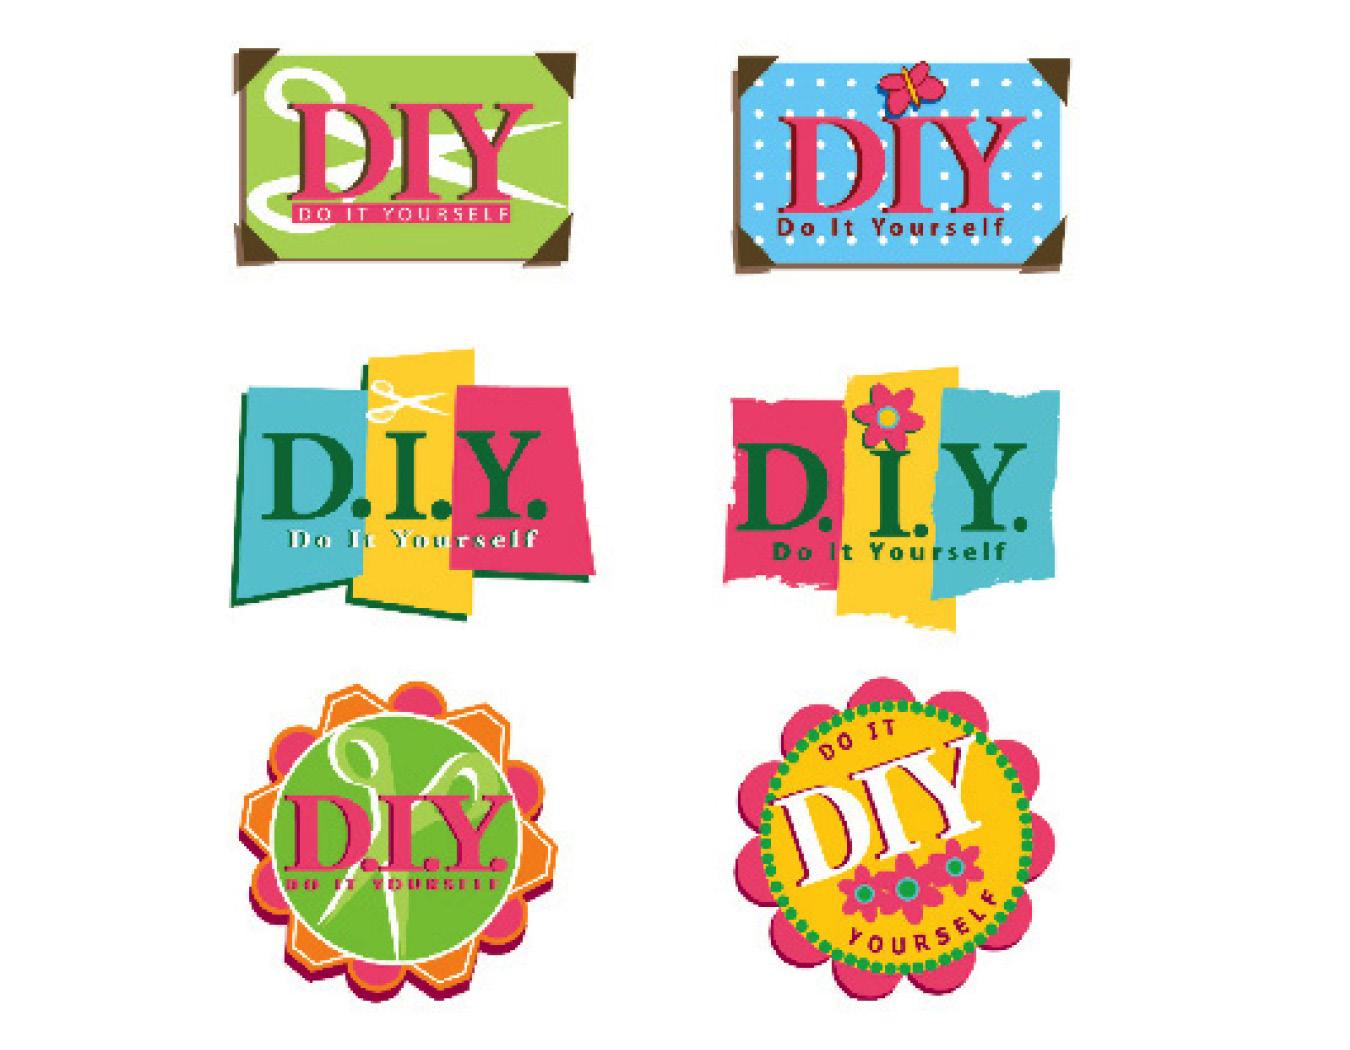 Do-it-Yourself logos